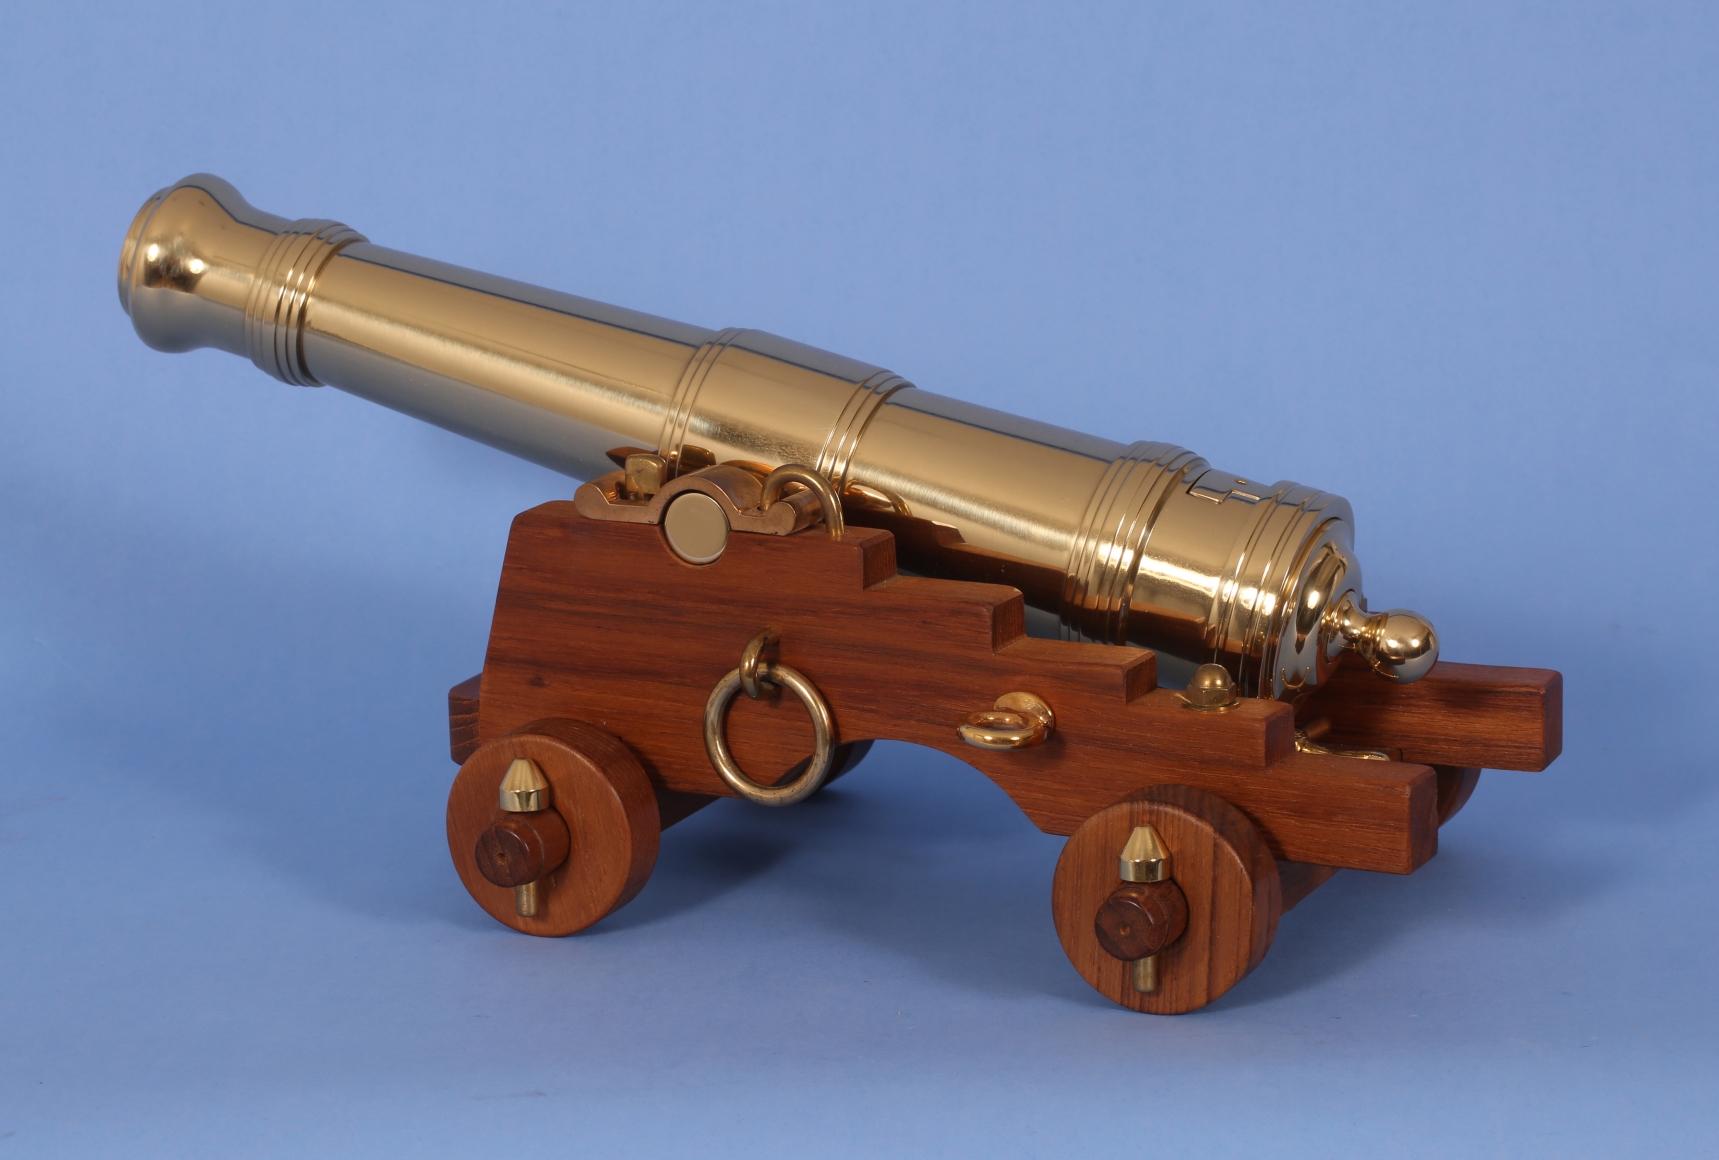 Herreshoff 10GA Saluting Cannon by Bellmore & Johnson